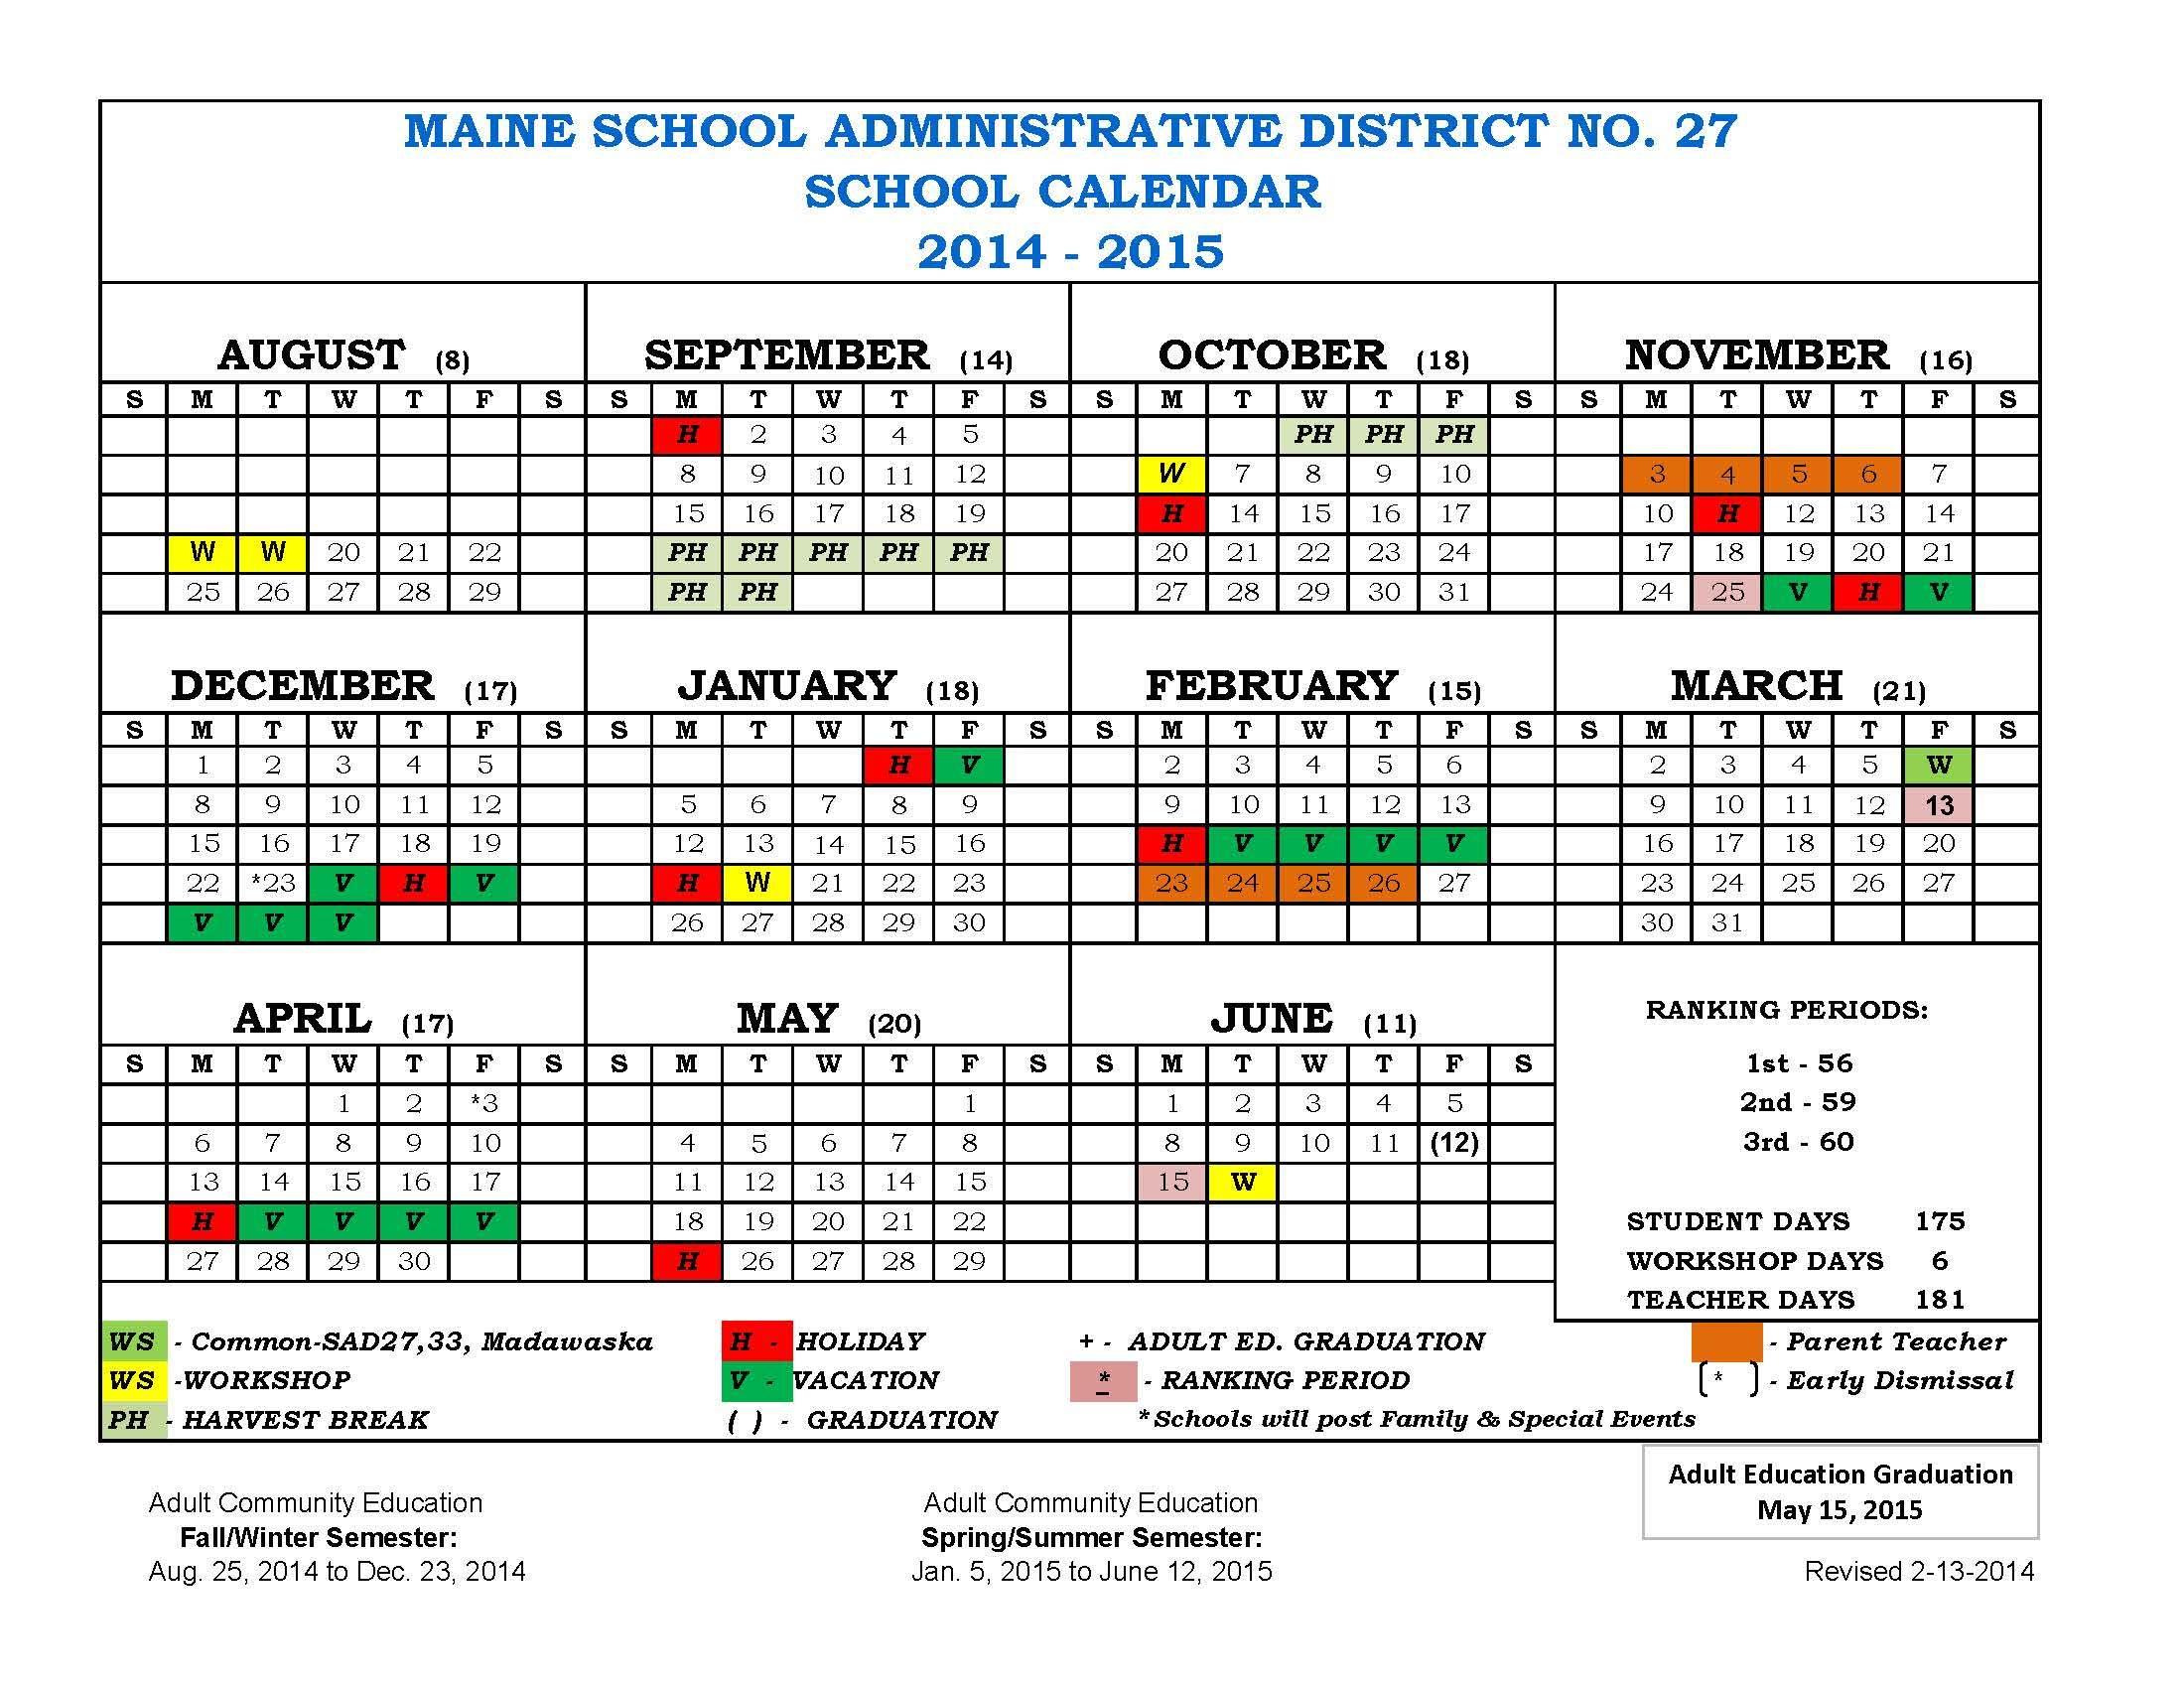 Fresno Unified School District Calendar 2020 Fresno Unified School Year 2017 Calendar | Calendar Template 2019